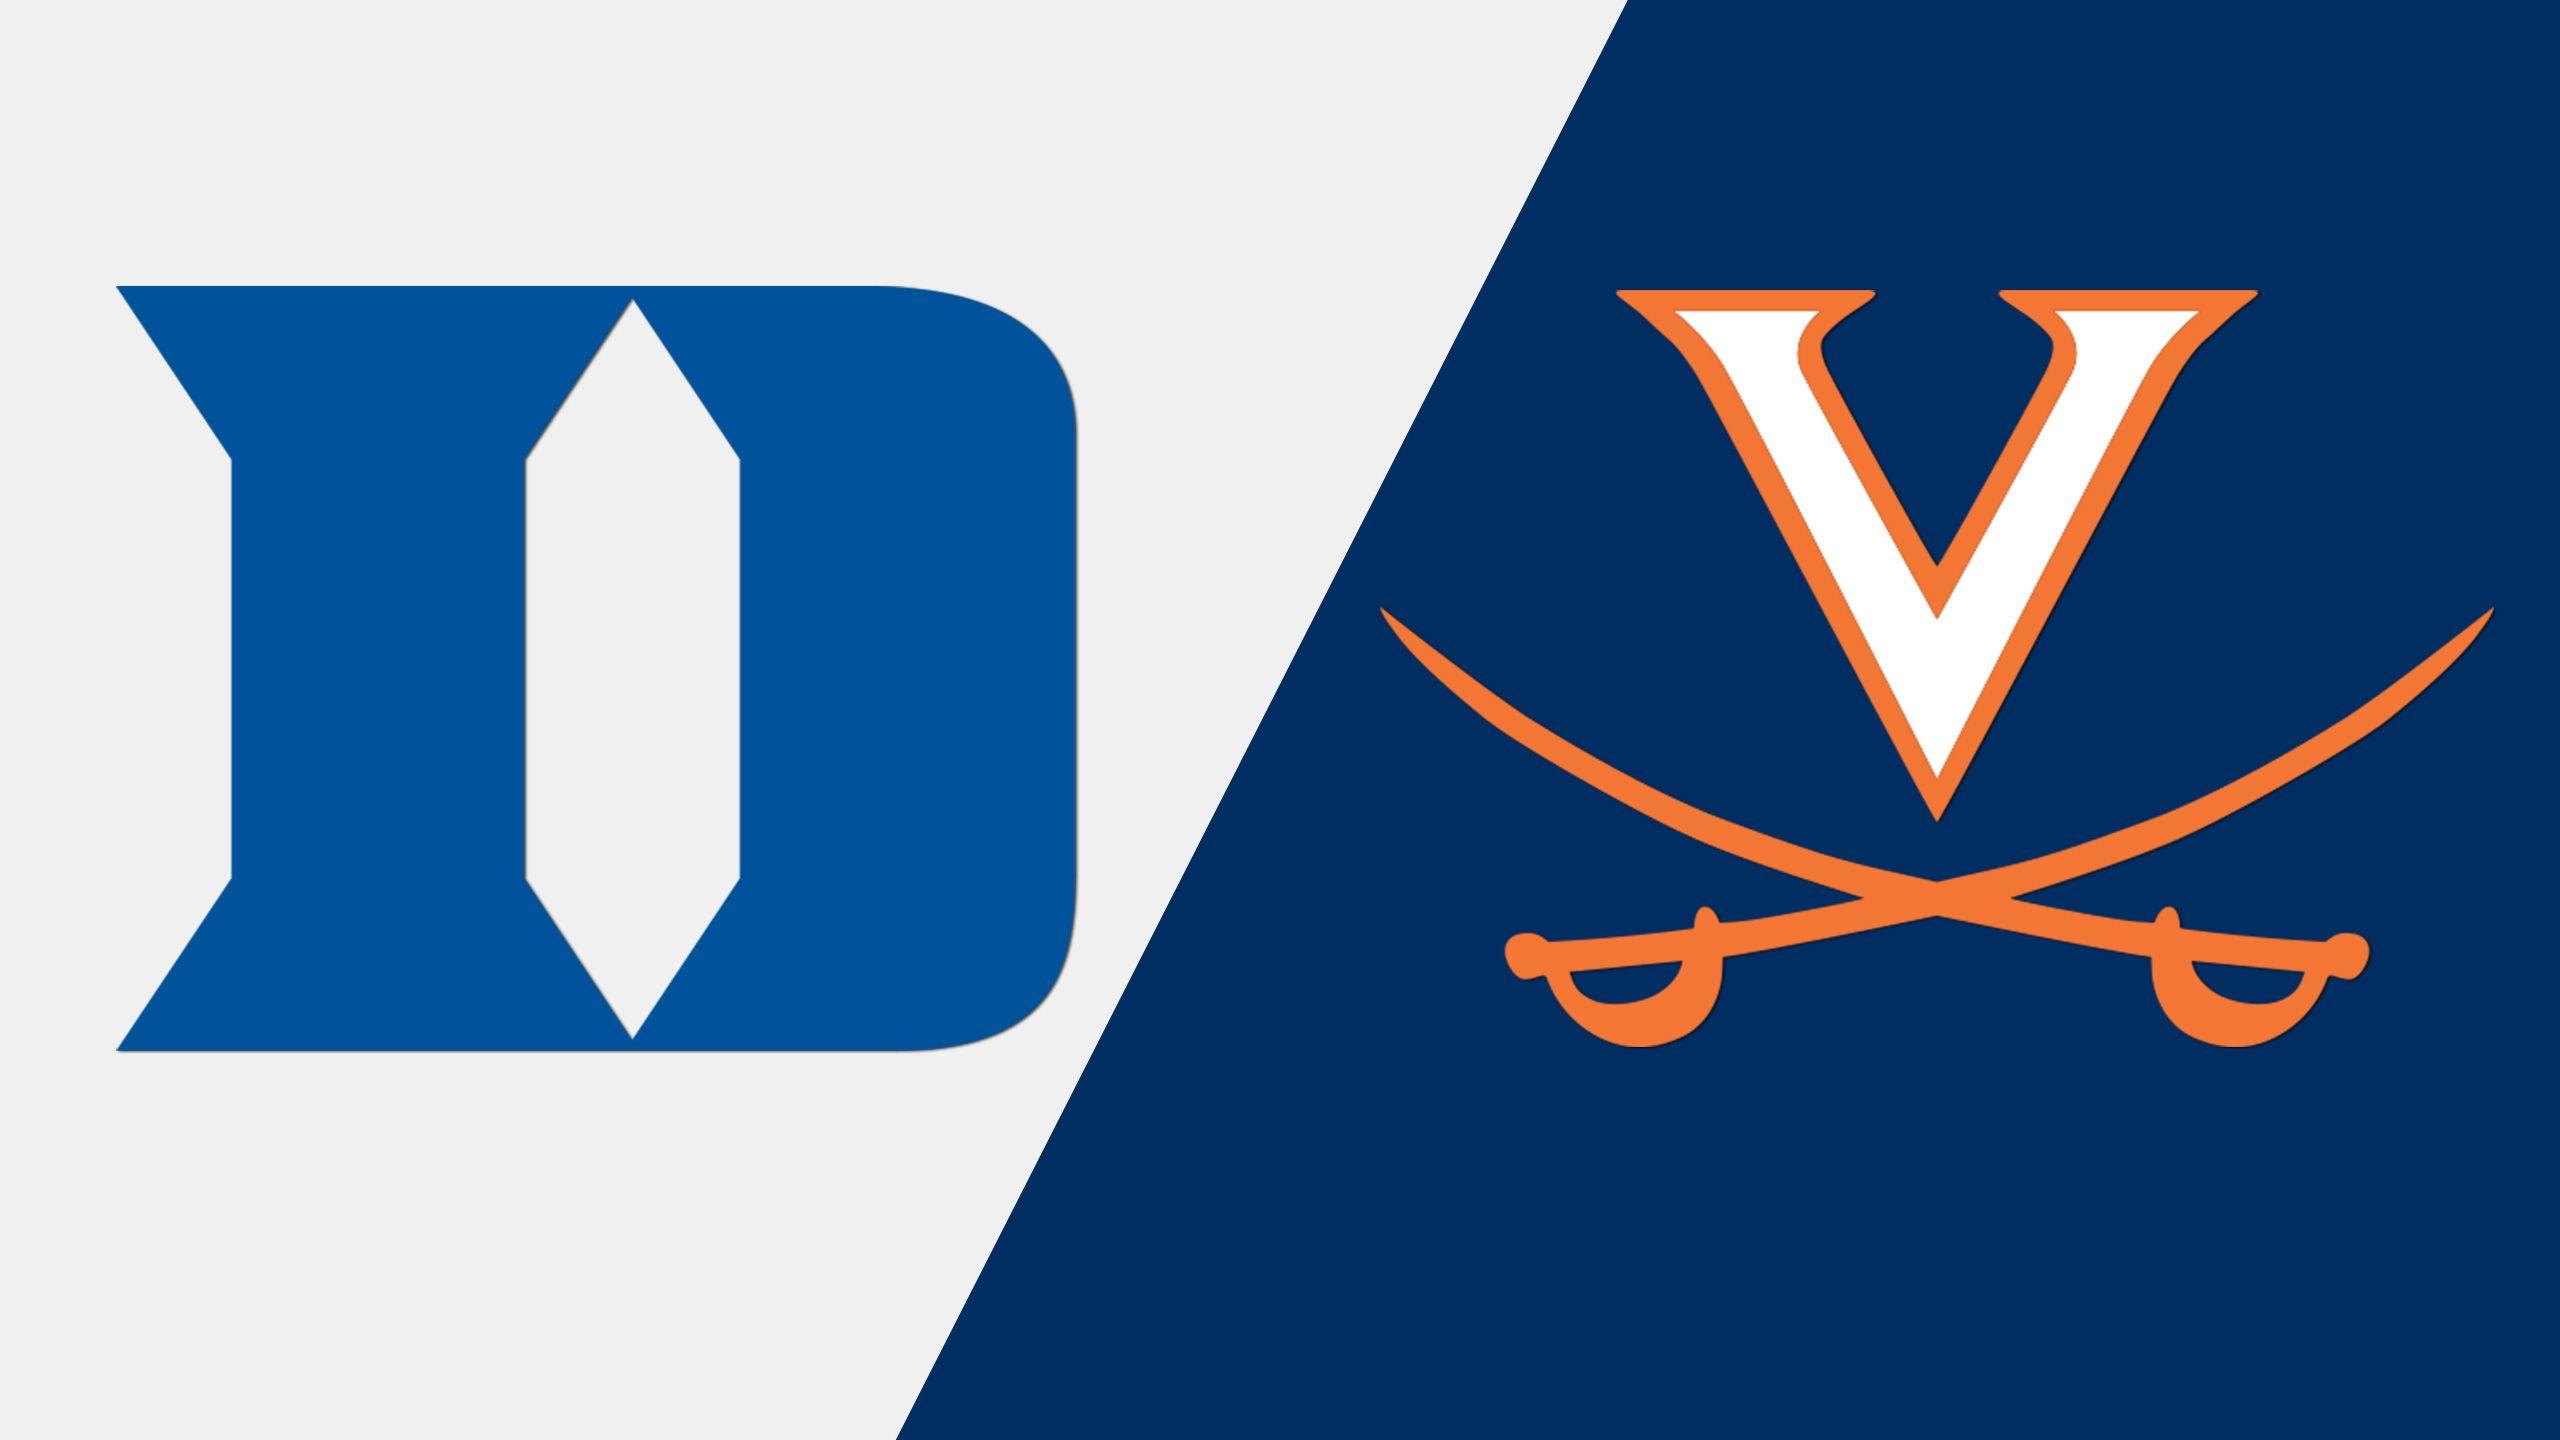 #5 Duke vs. #12 Virginia (M Lacrosse)